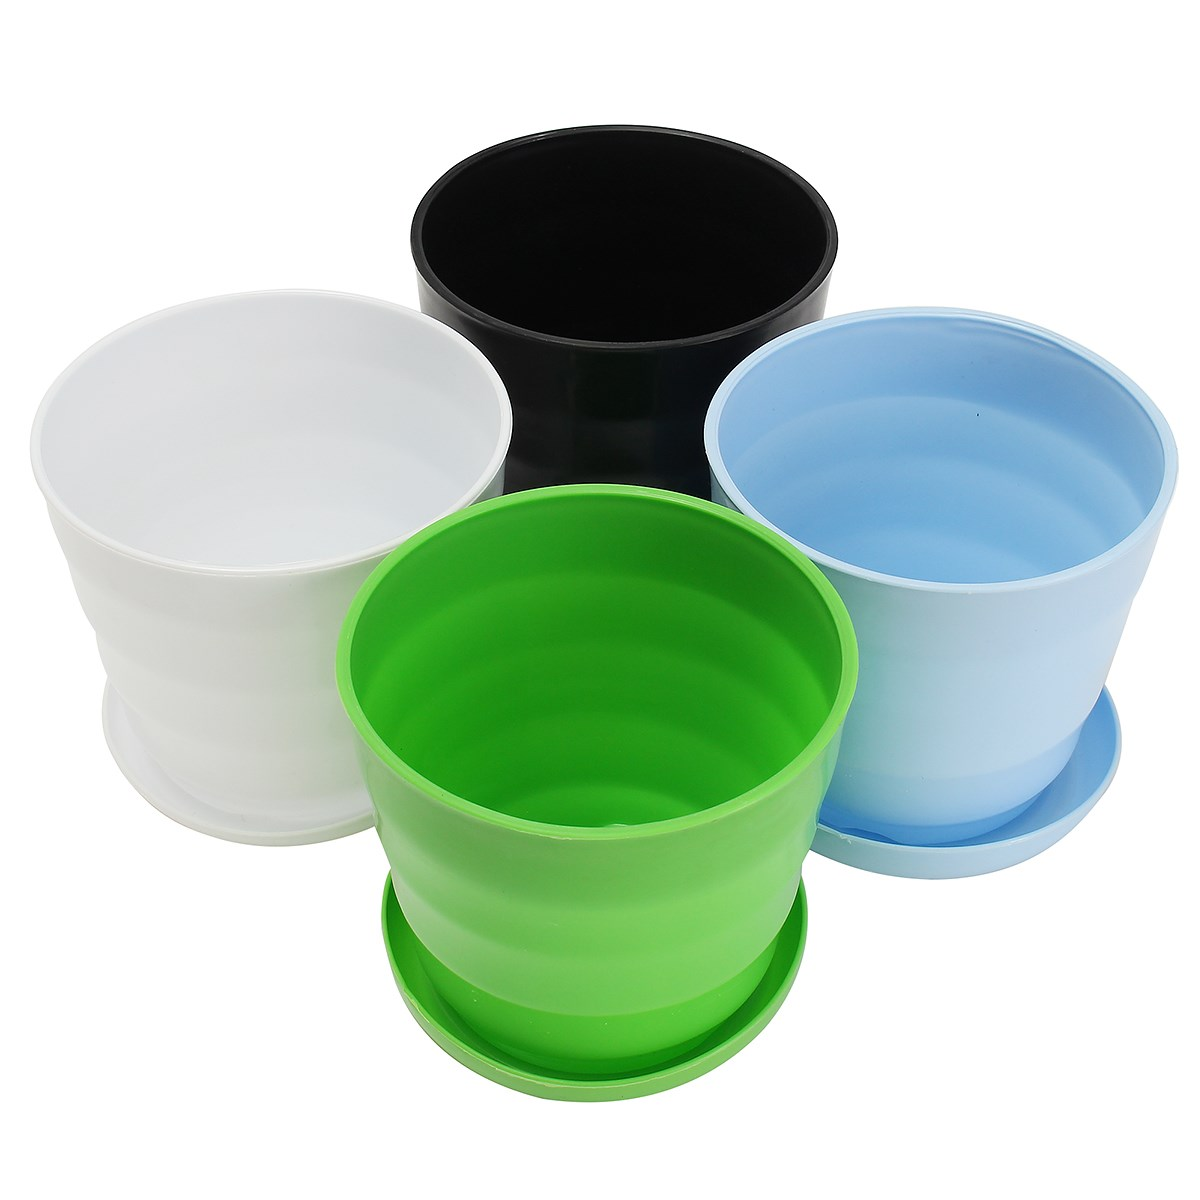 online get cheap garden pots plastic. Black Bedroom Furniture Sets. Home Design Ideas